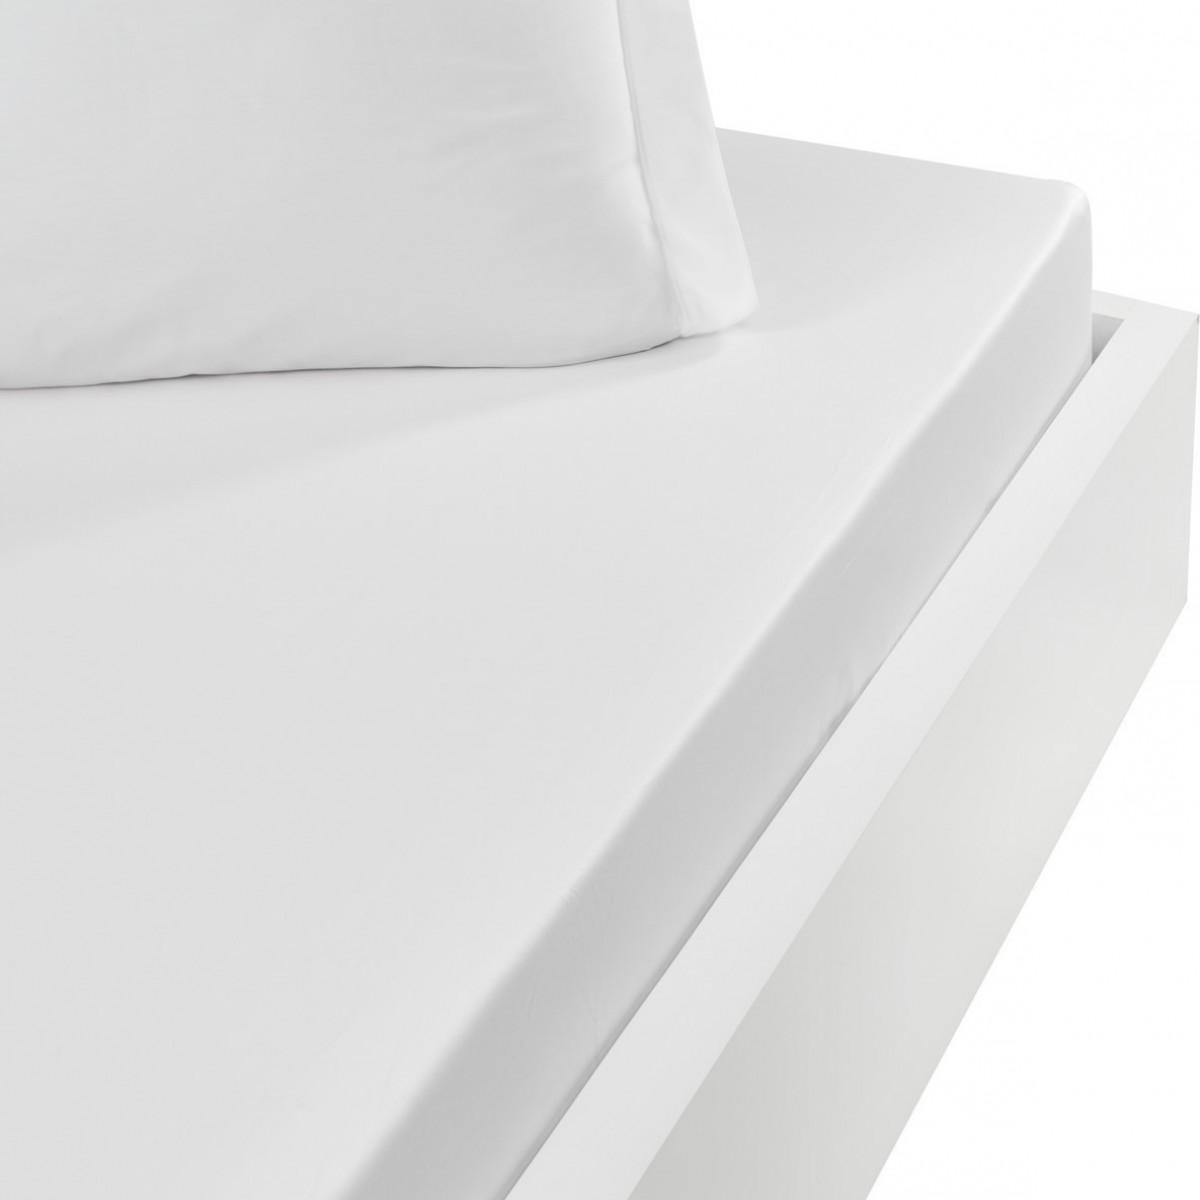 Drap housse en percale de coton bon Blanc 180x200 cm